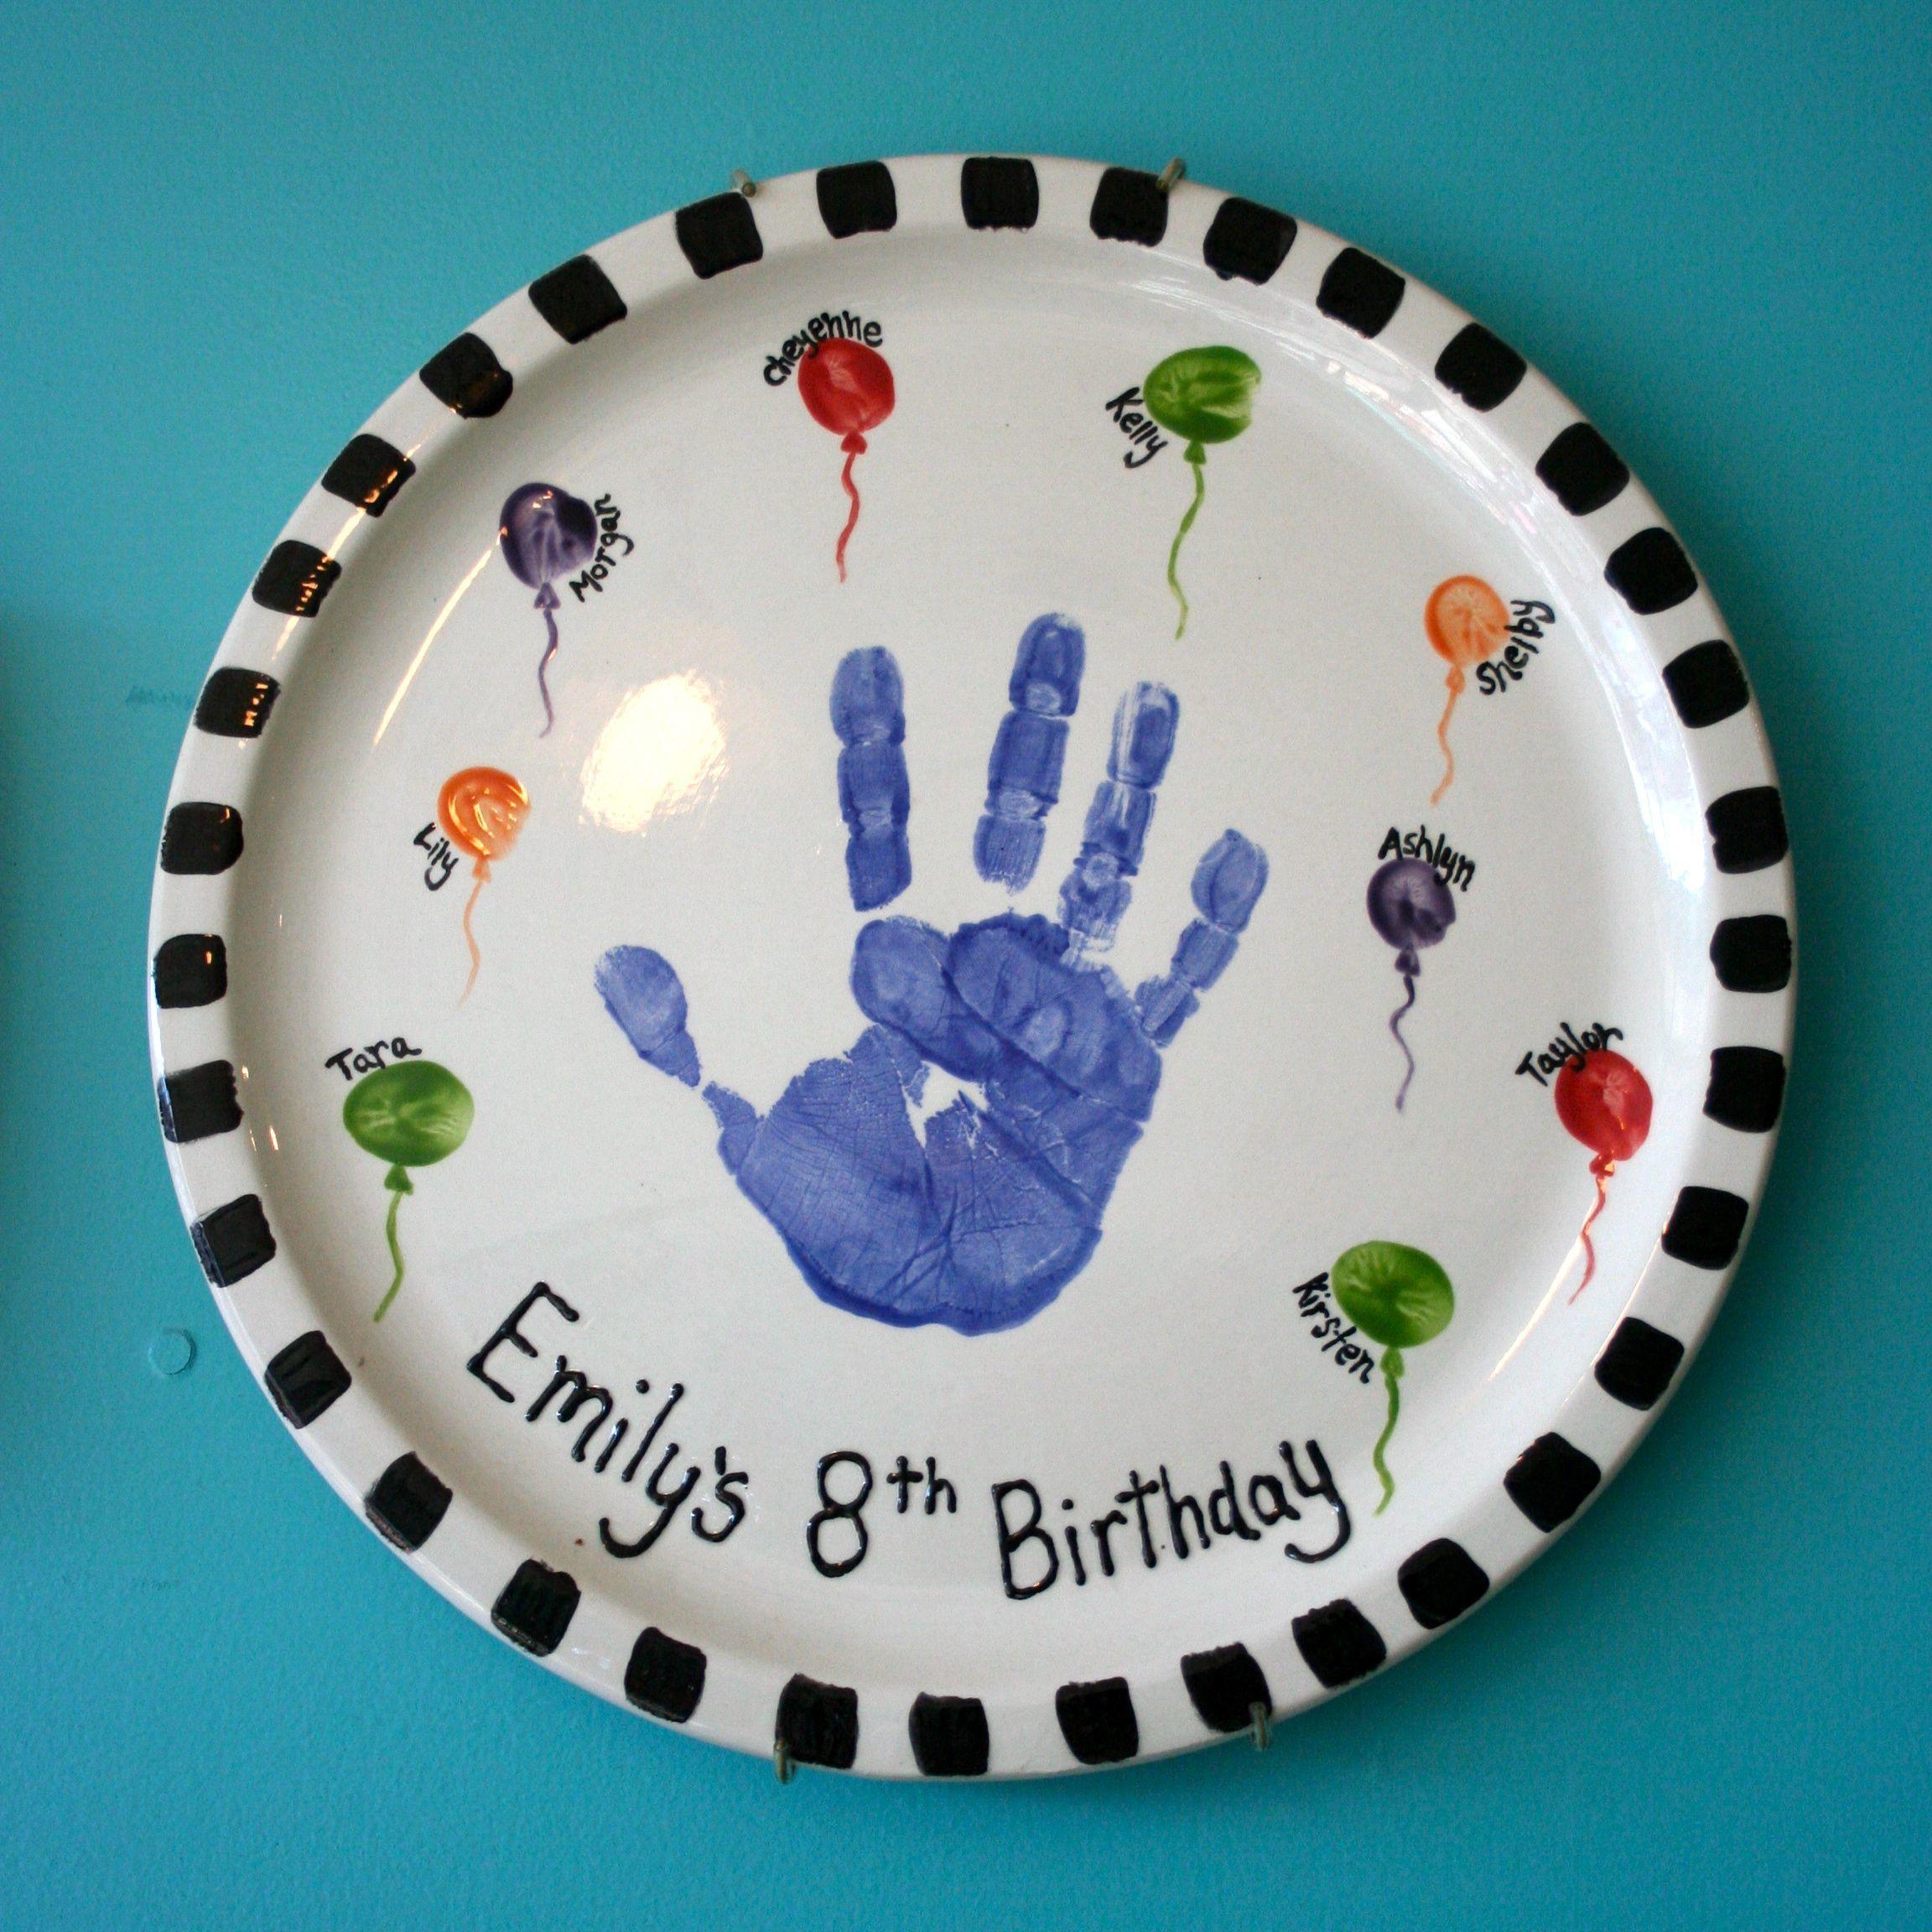 Emily's Birthday